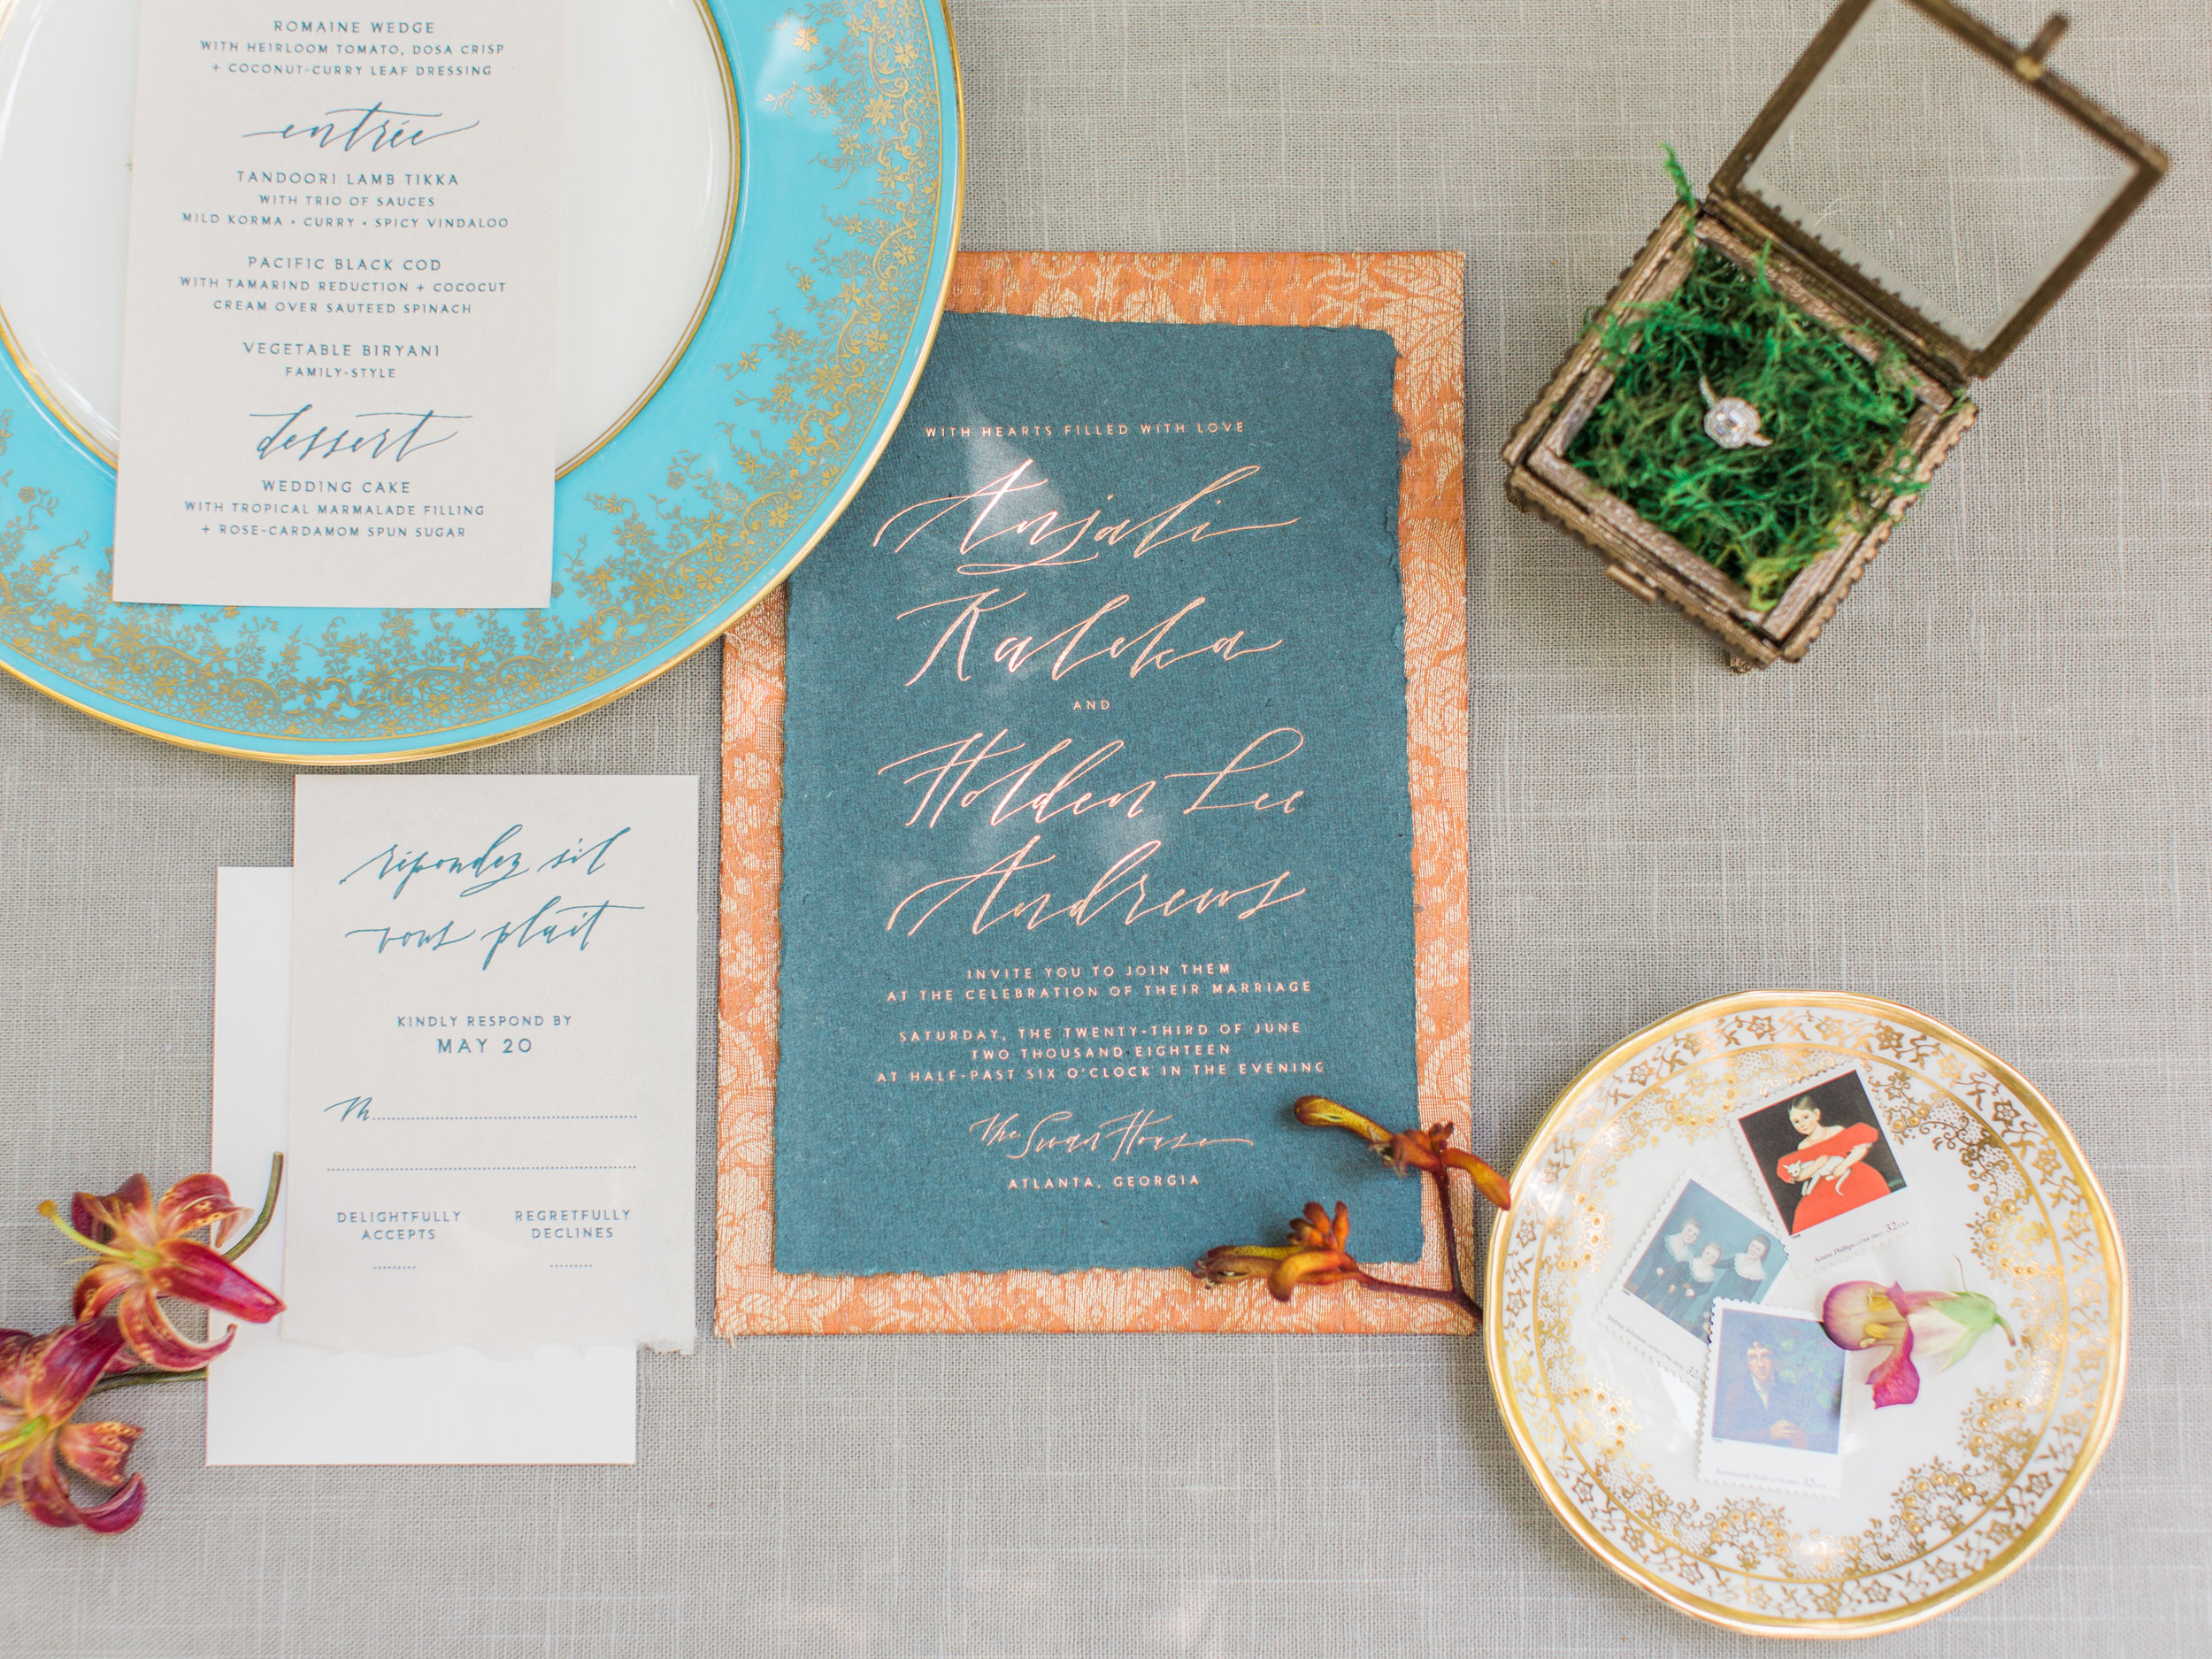 SwanHouse_Digital-15_Events by Reagan_Kansas City_Charleston_Destination_Wedding Planner.jpg